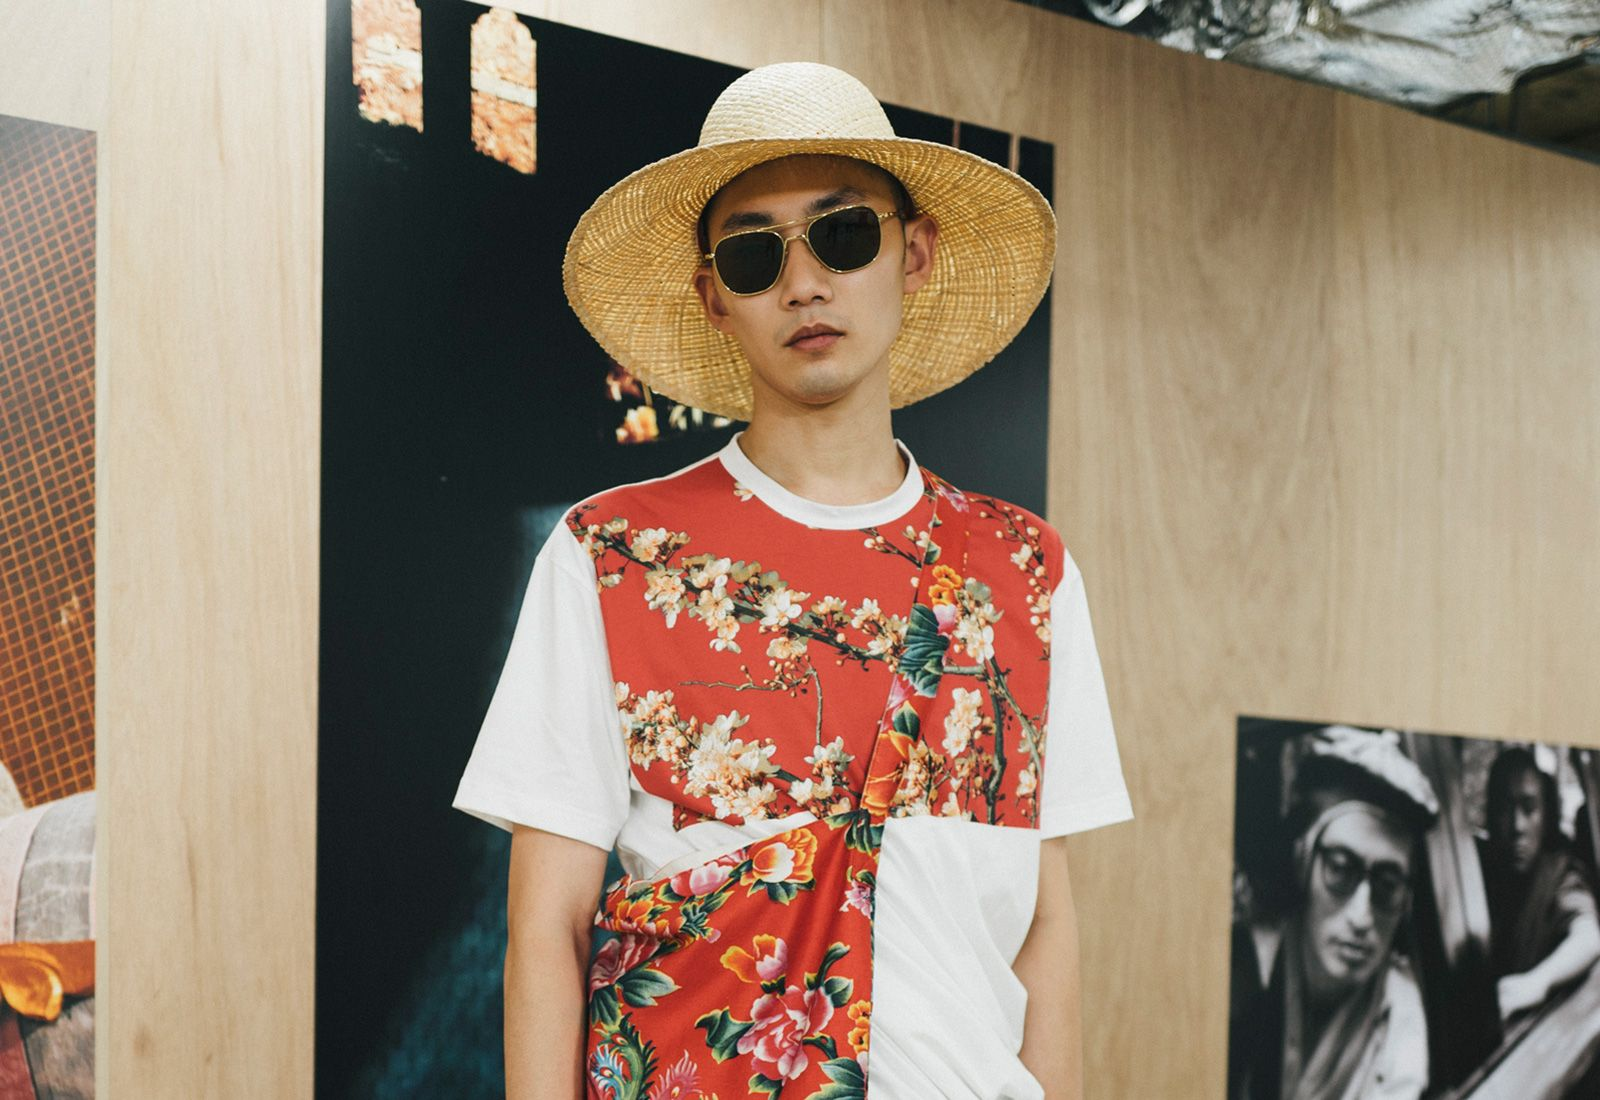 junya-watanabe-spring-summer-2022-collection-header